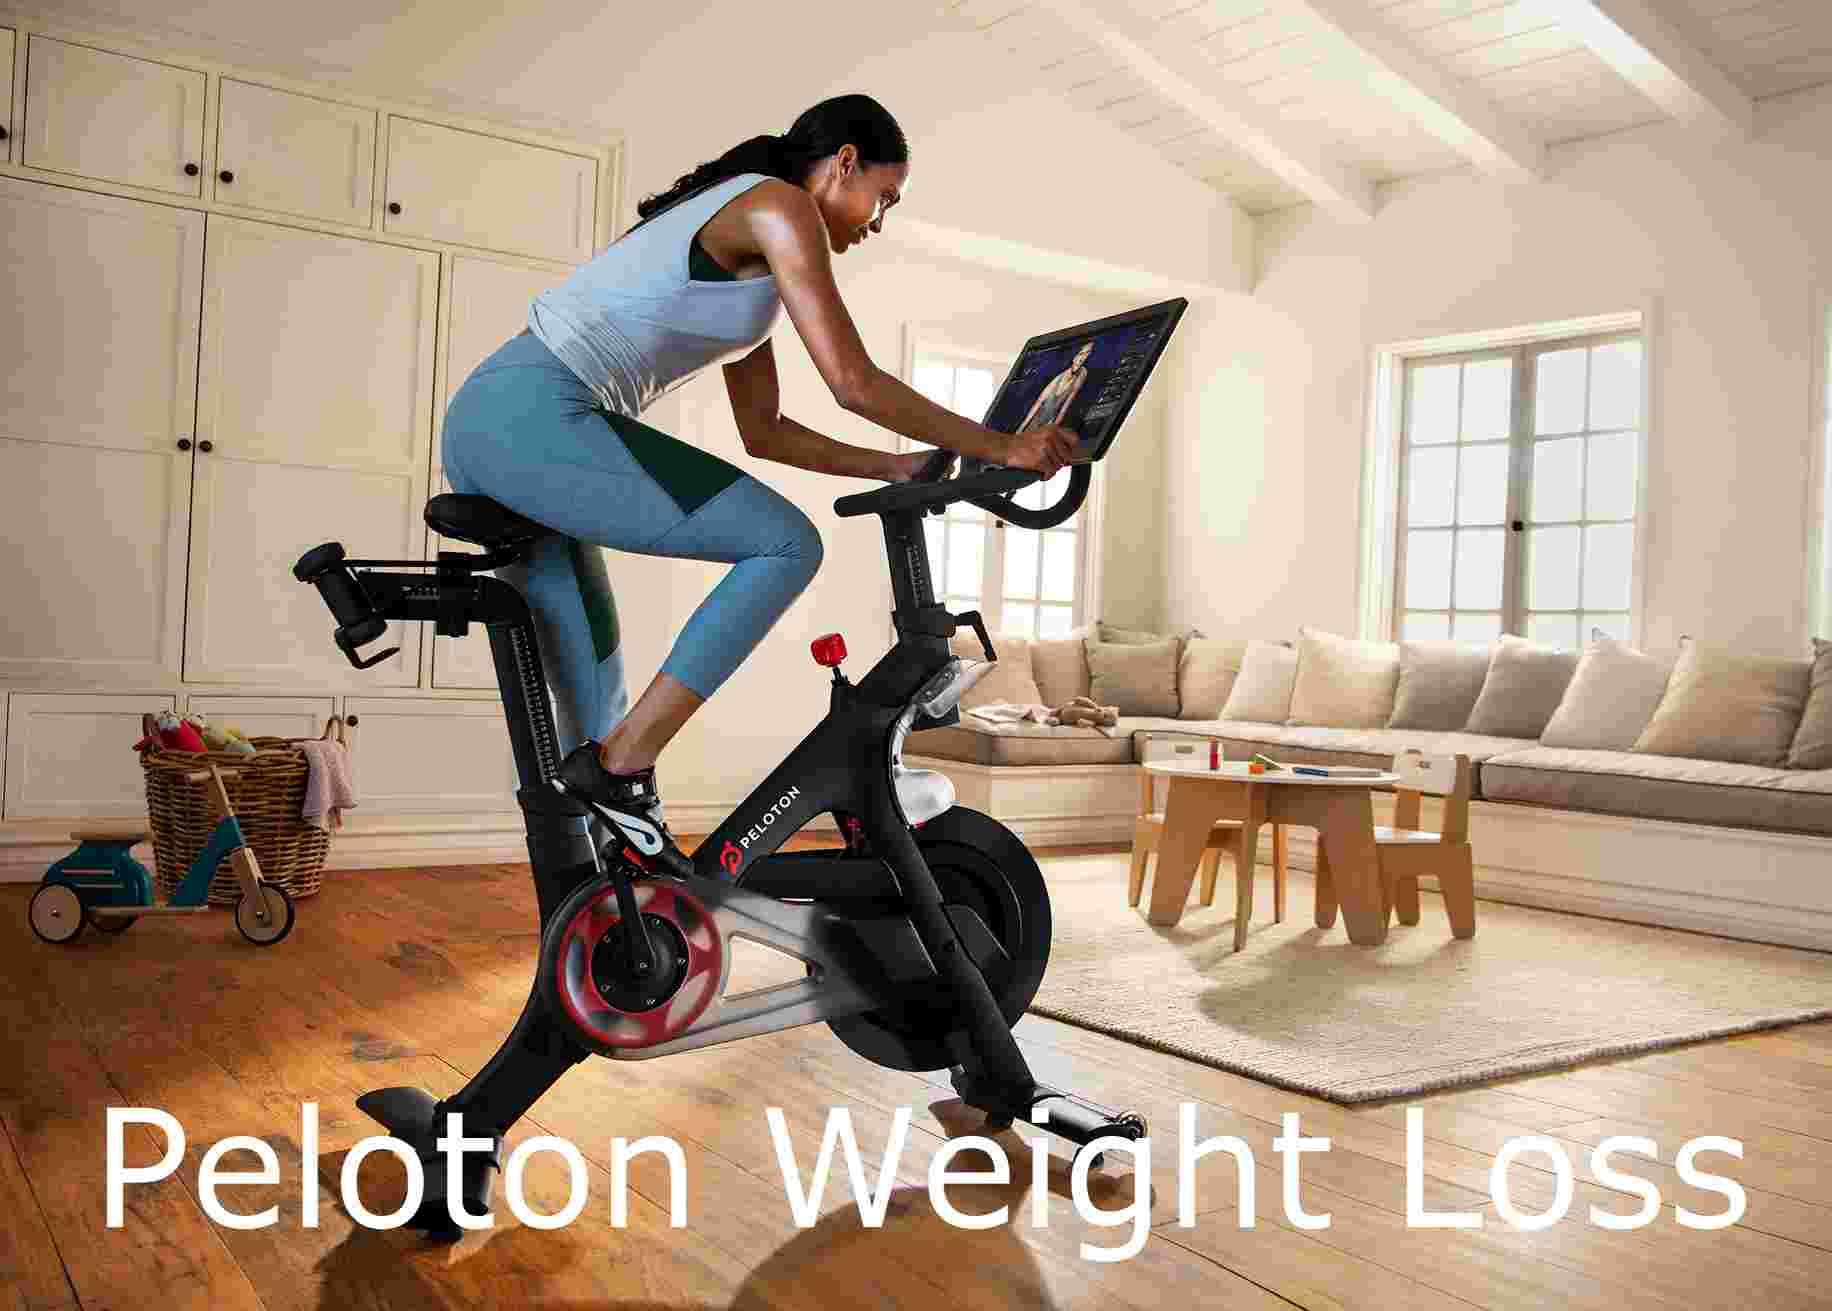 Peloton Weight Loss